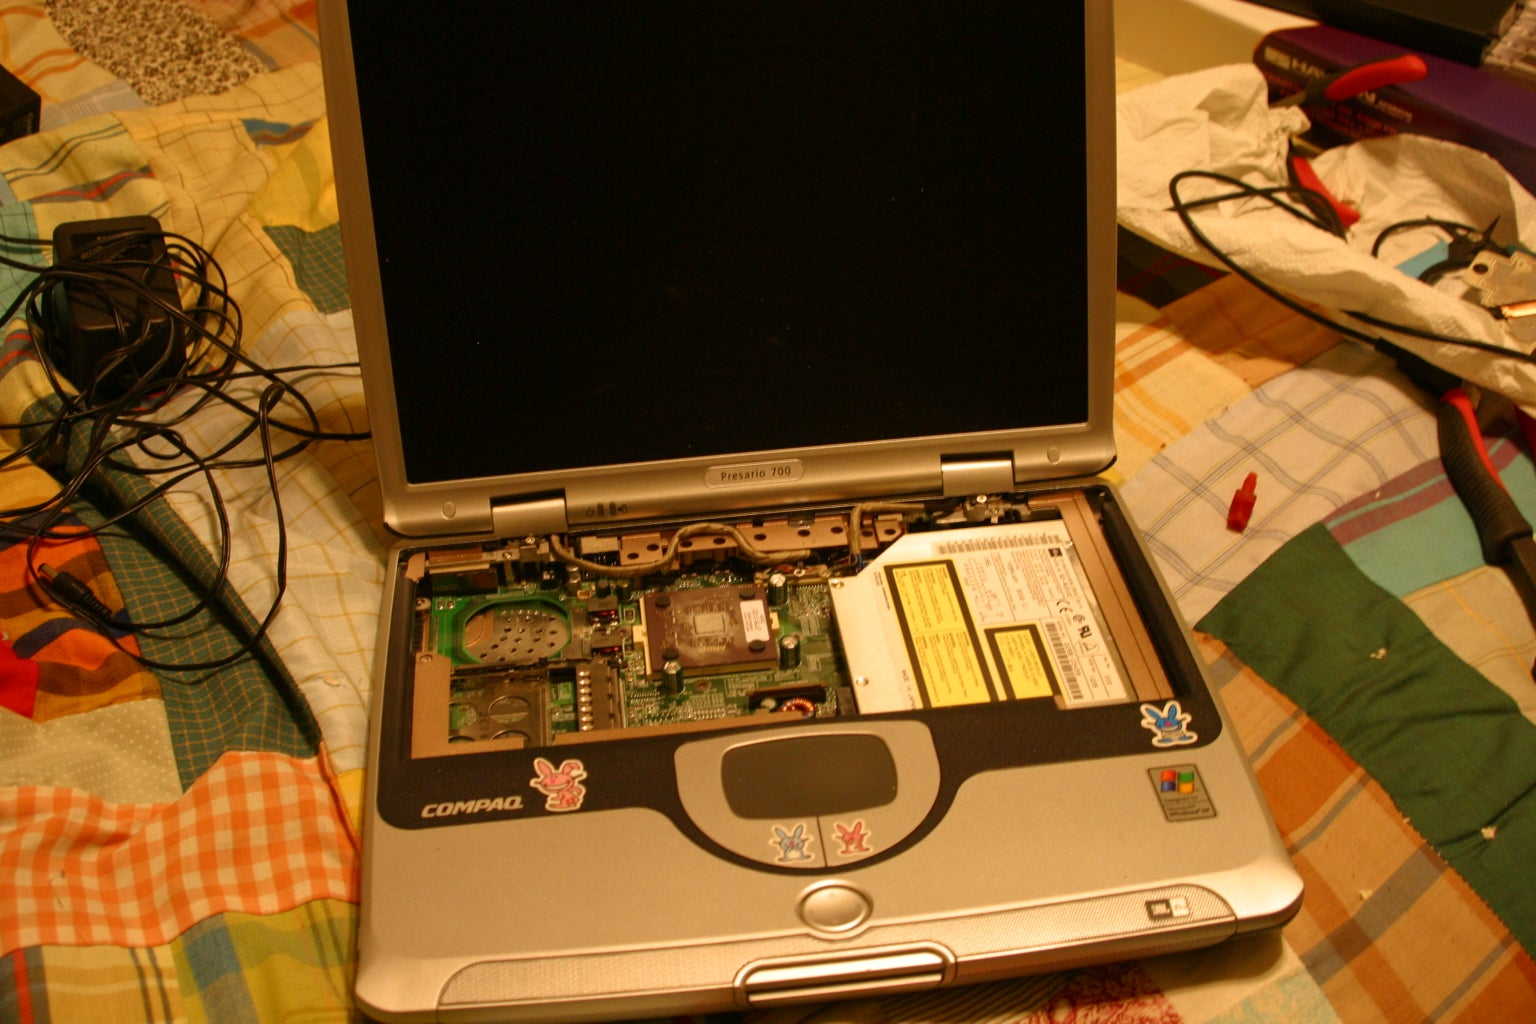 Dismantle Computer